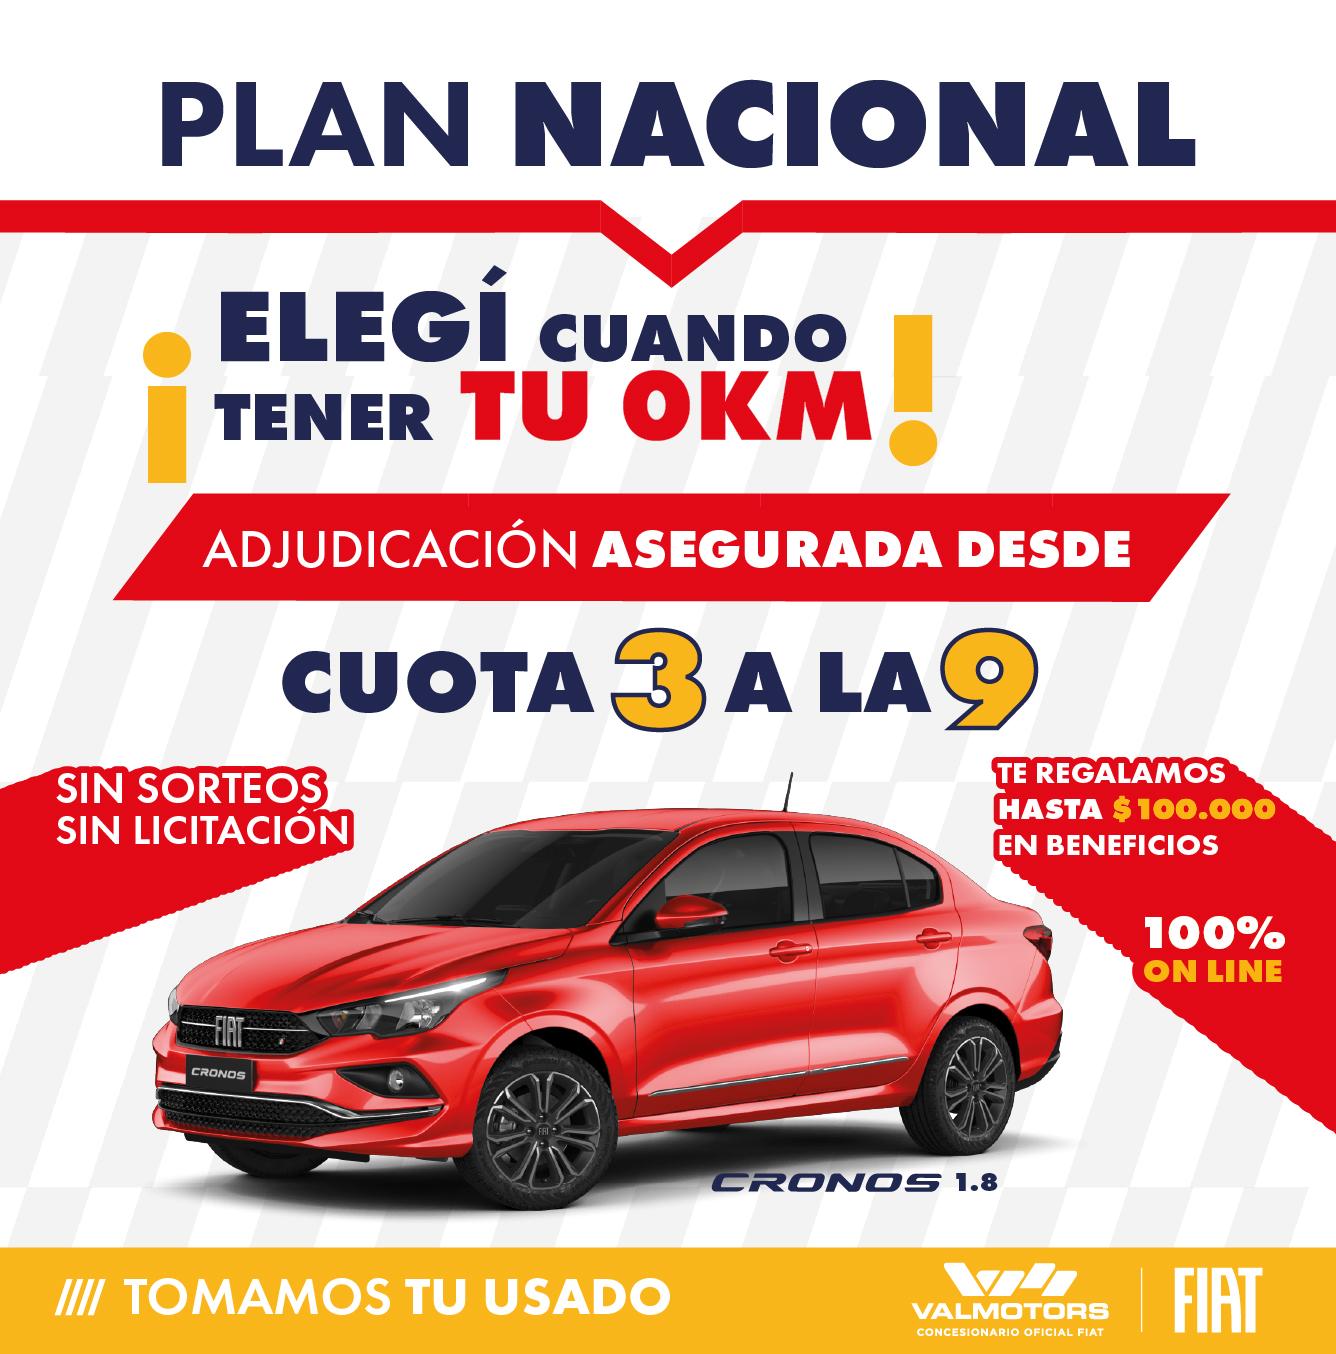 28062021 PA Plan Nacional